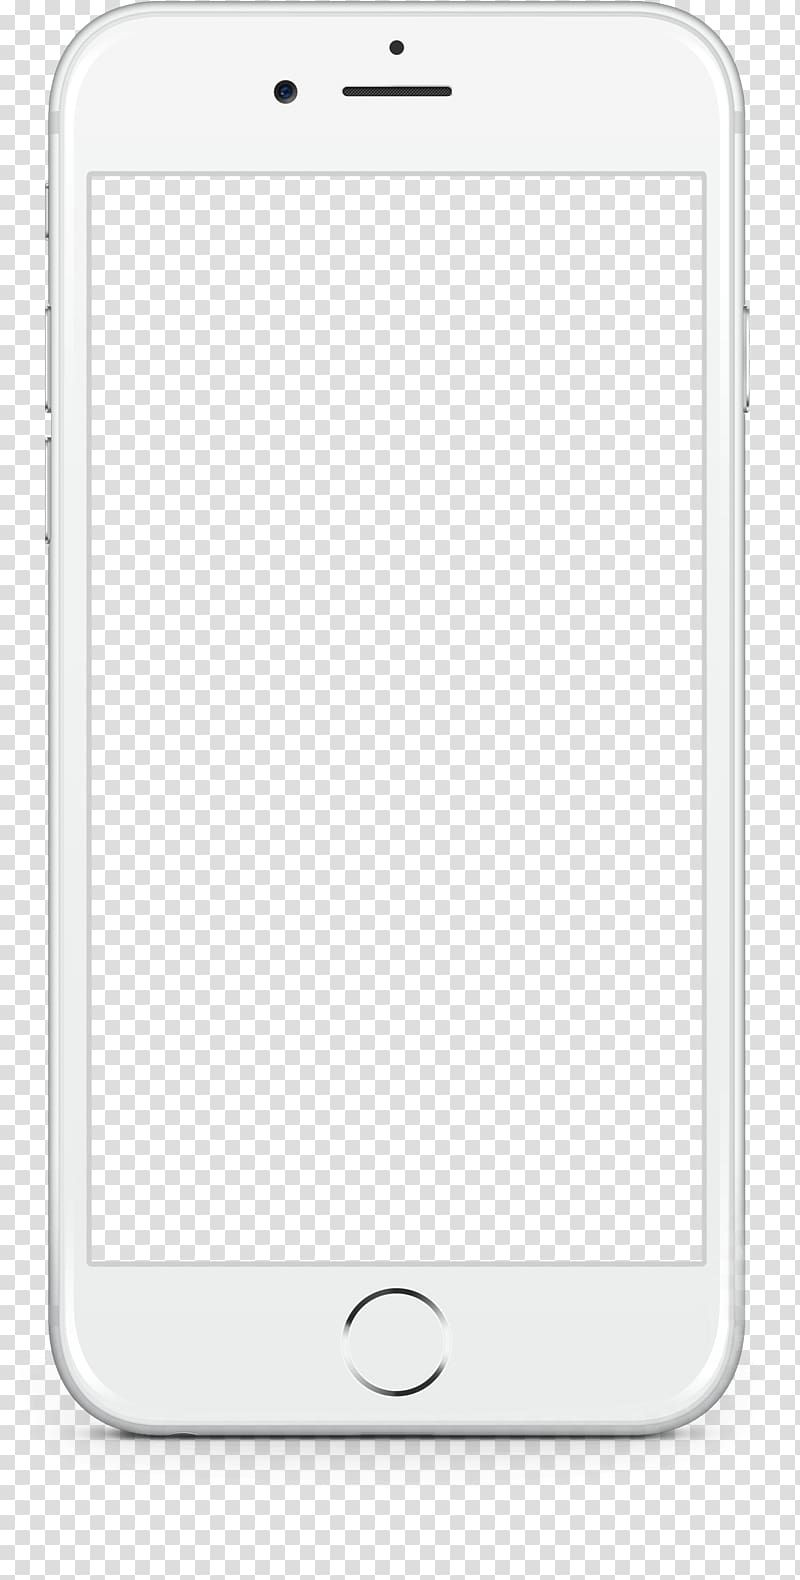 Iphone Digitizer Iphone 6 Smartphone Iphone Transparent Background Png Clipart Wattpad Book Covers Screen Protector Iphone Book Cover Background